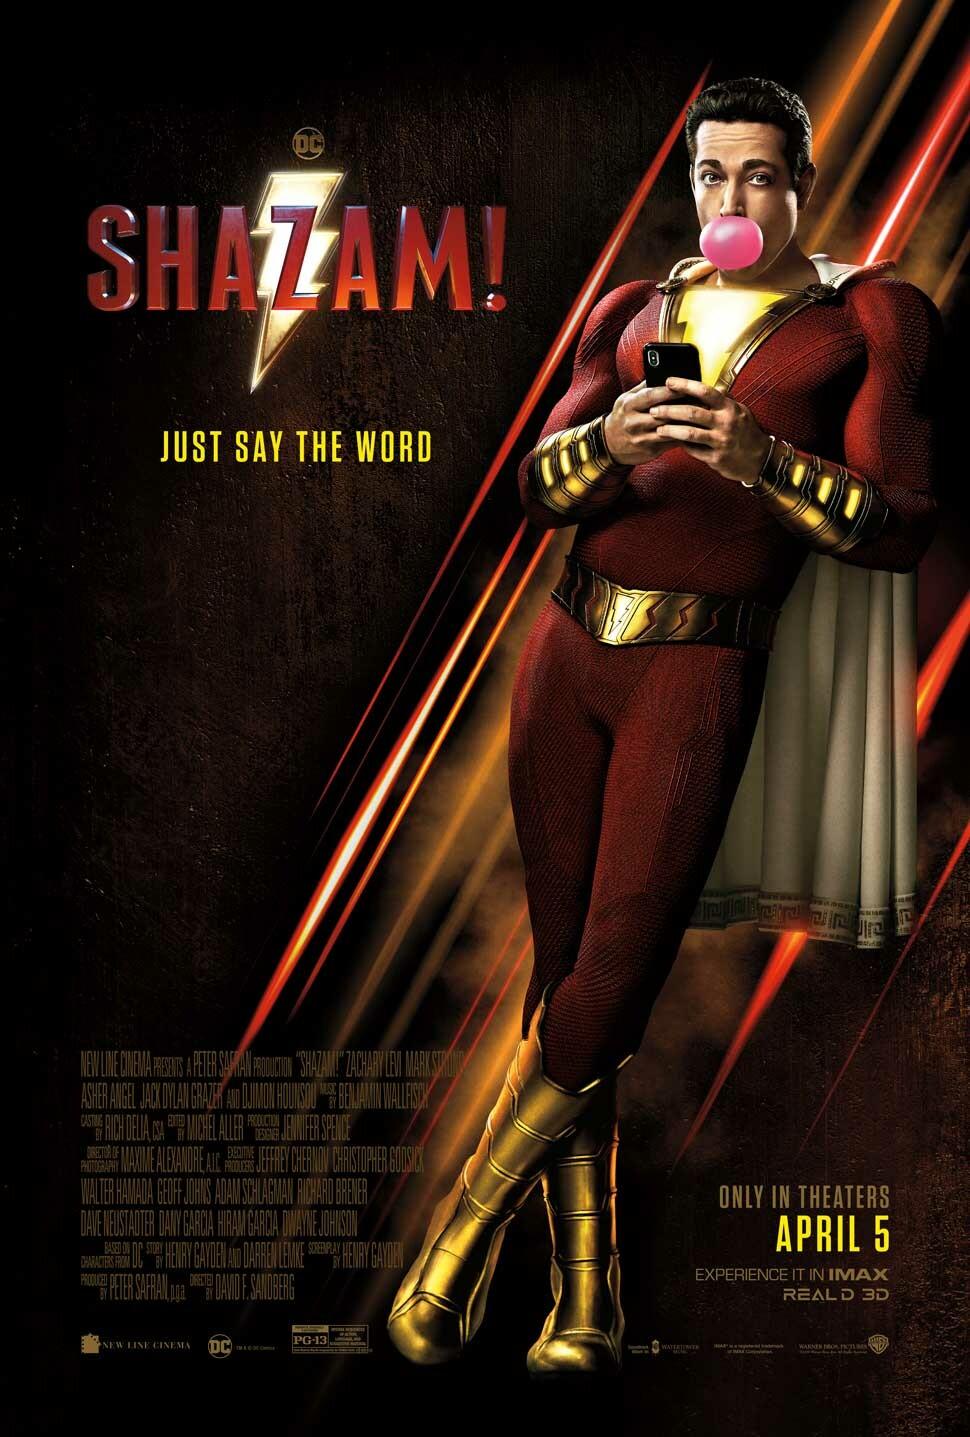 Shazam! 6 Güç - Shazam! (2019) 1080p NF WEB-DL DDP5.1 H.264 DUAL [TR EN]